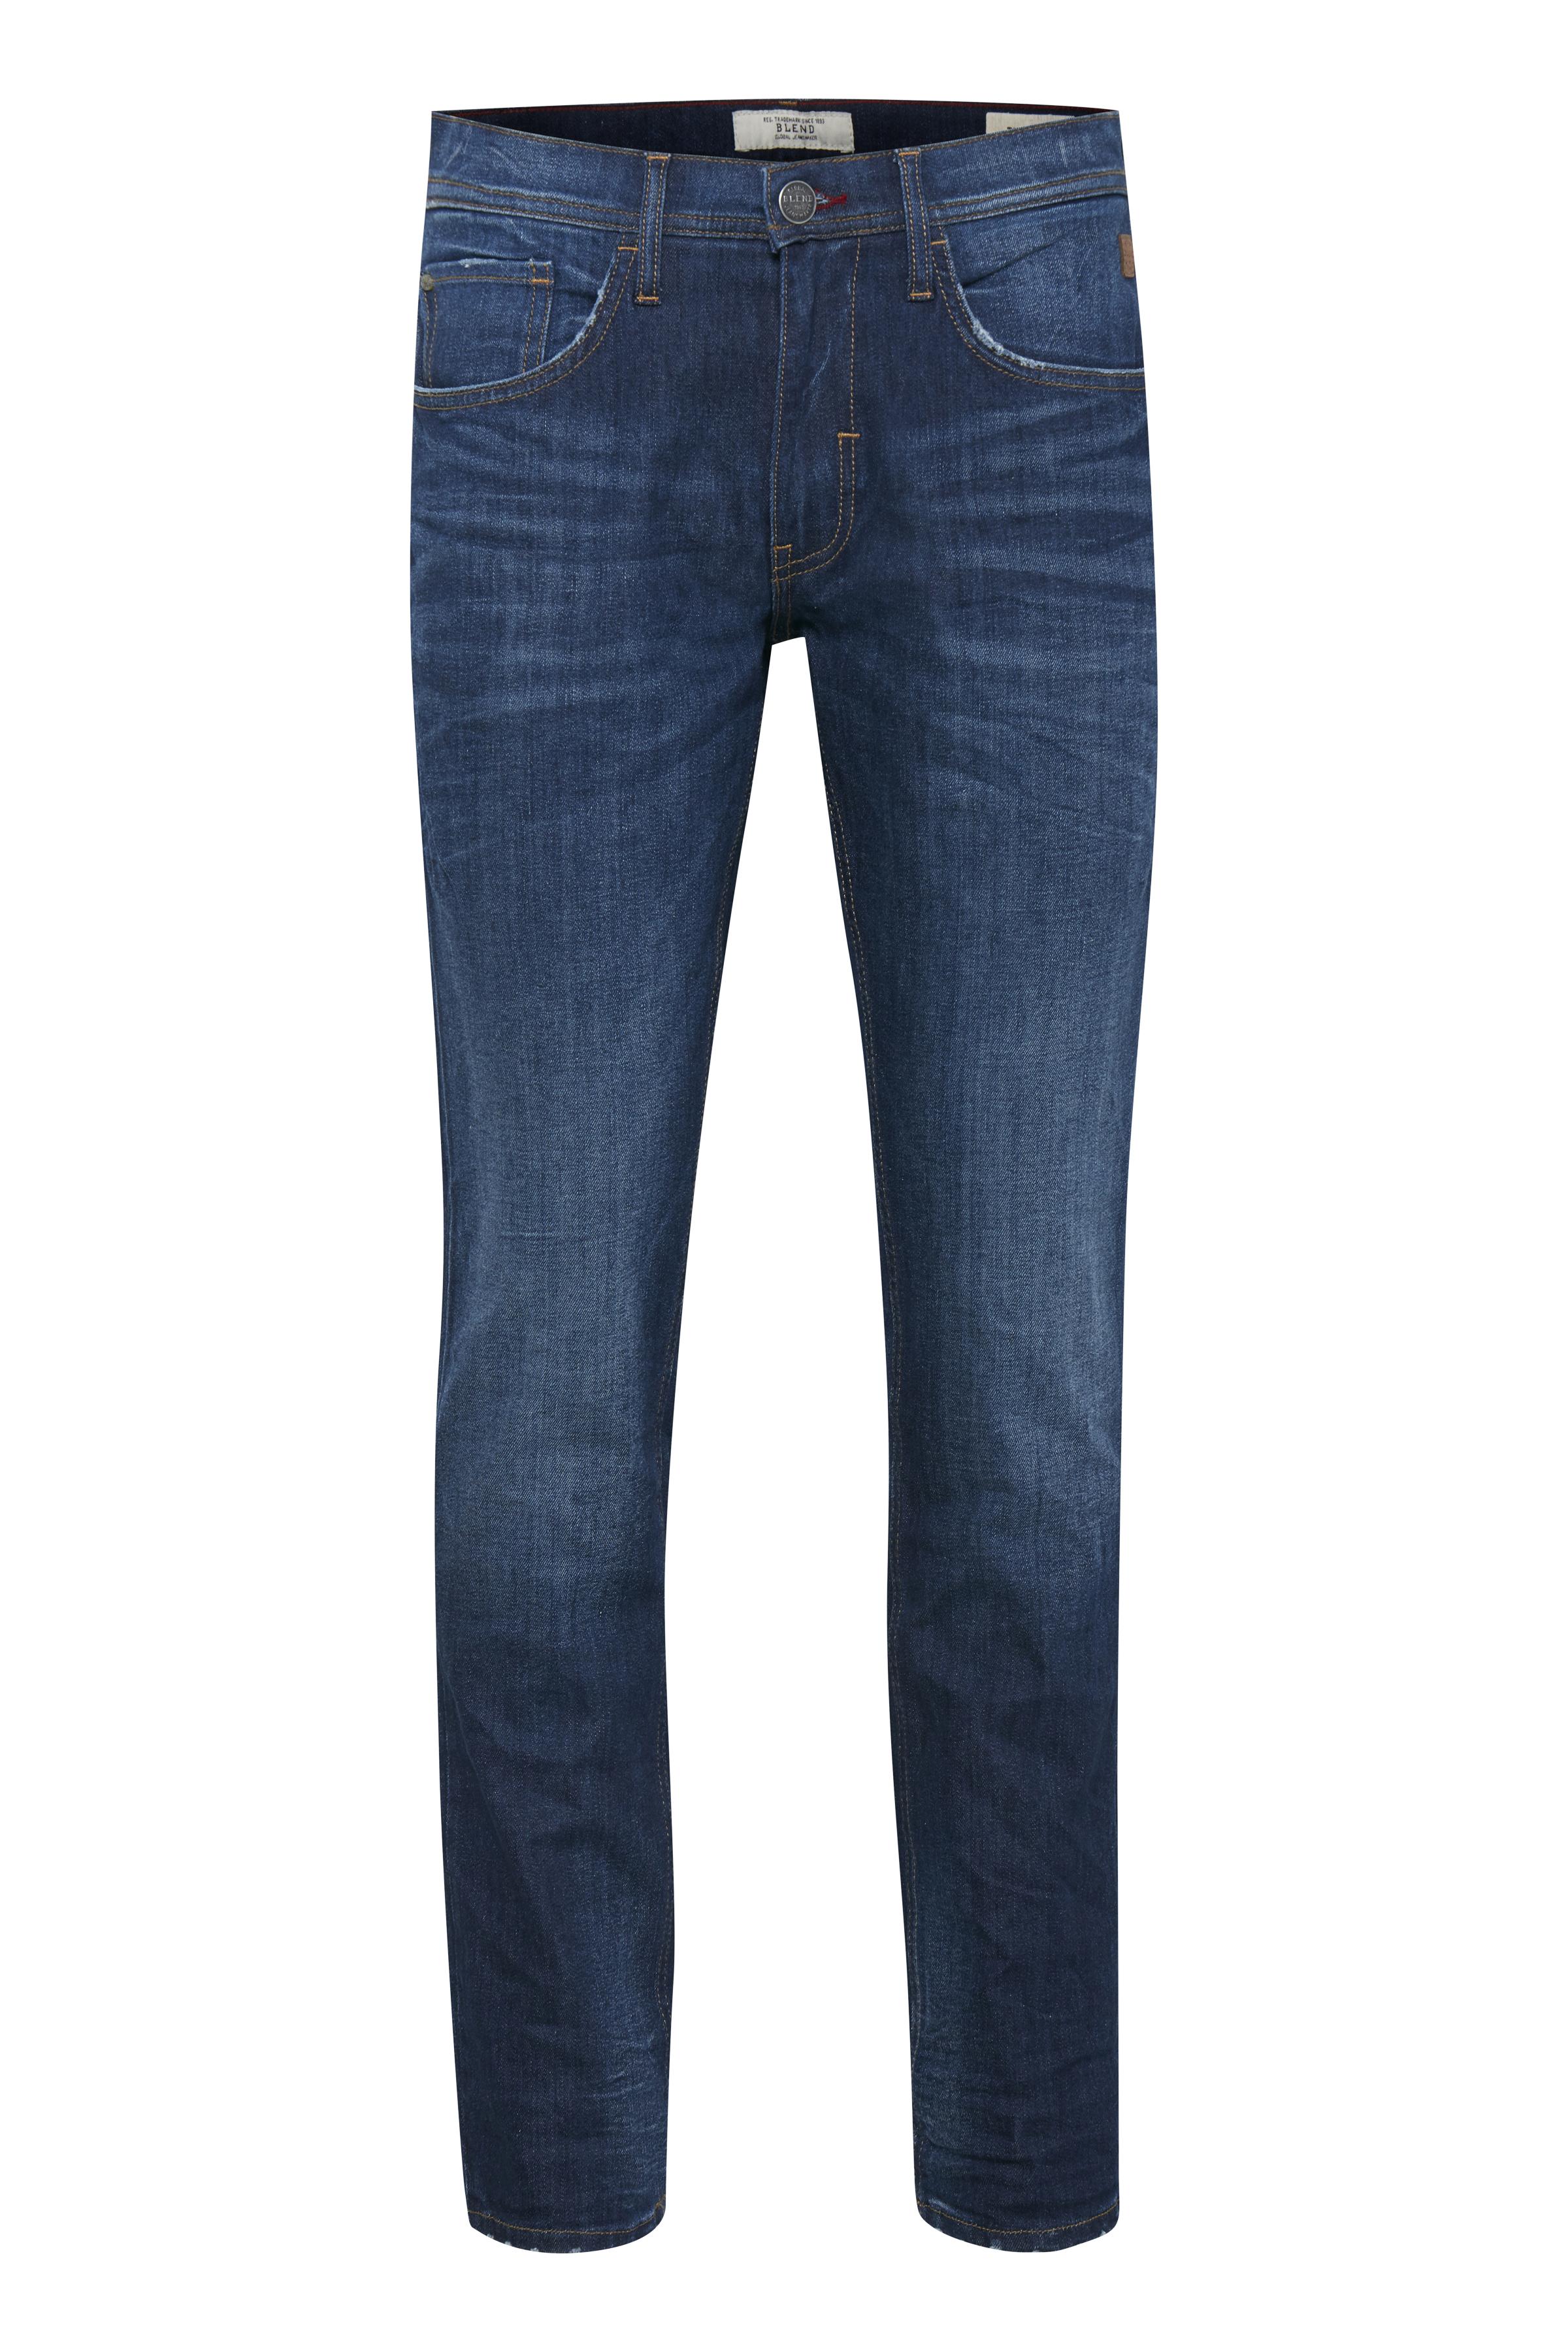 Denim dark blue Twister jeans fra Blend He – Køb Denim dark blue Twister jeans fra str. 28-42 her